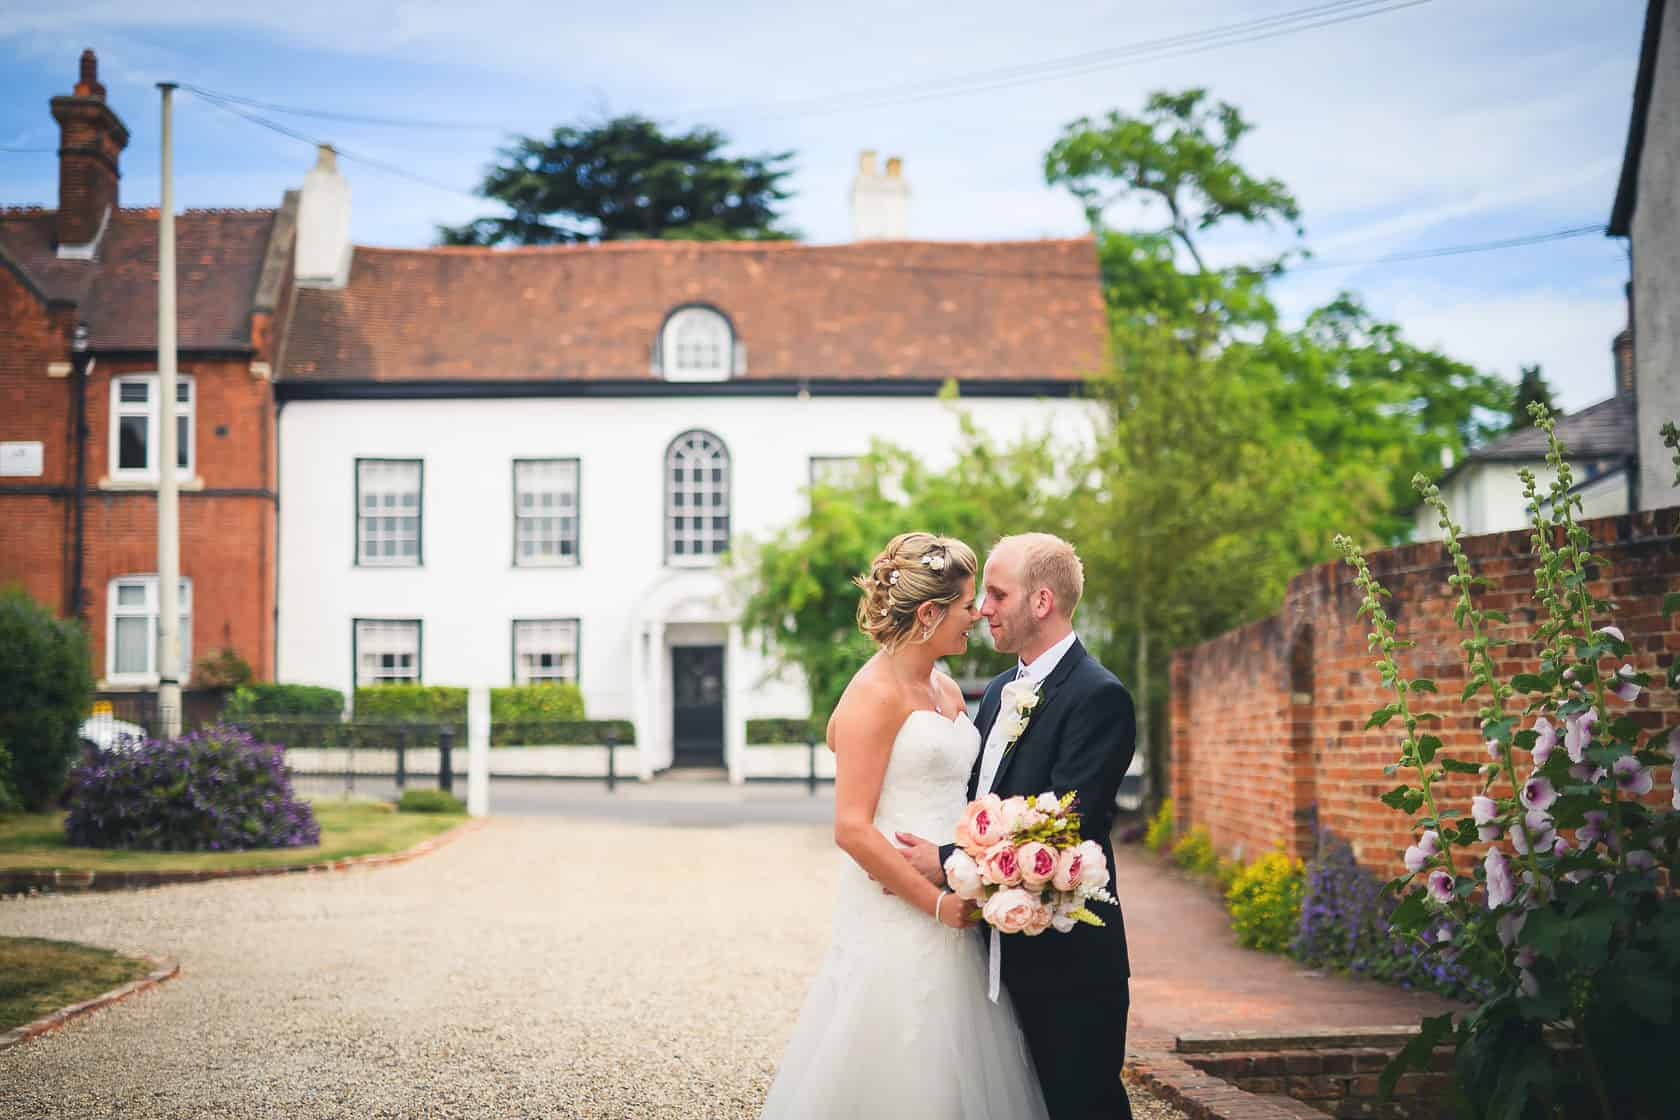 Best_Wedding_Photography_2018_Wedding-Photographer-Essex-and-London_050